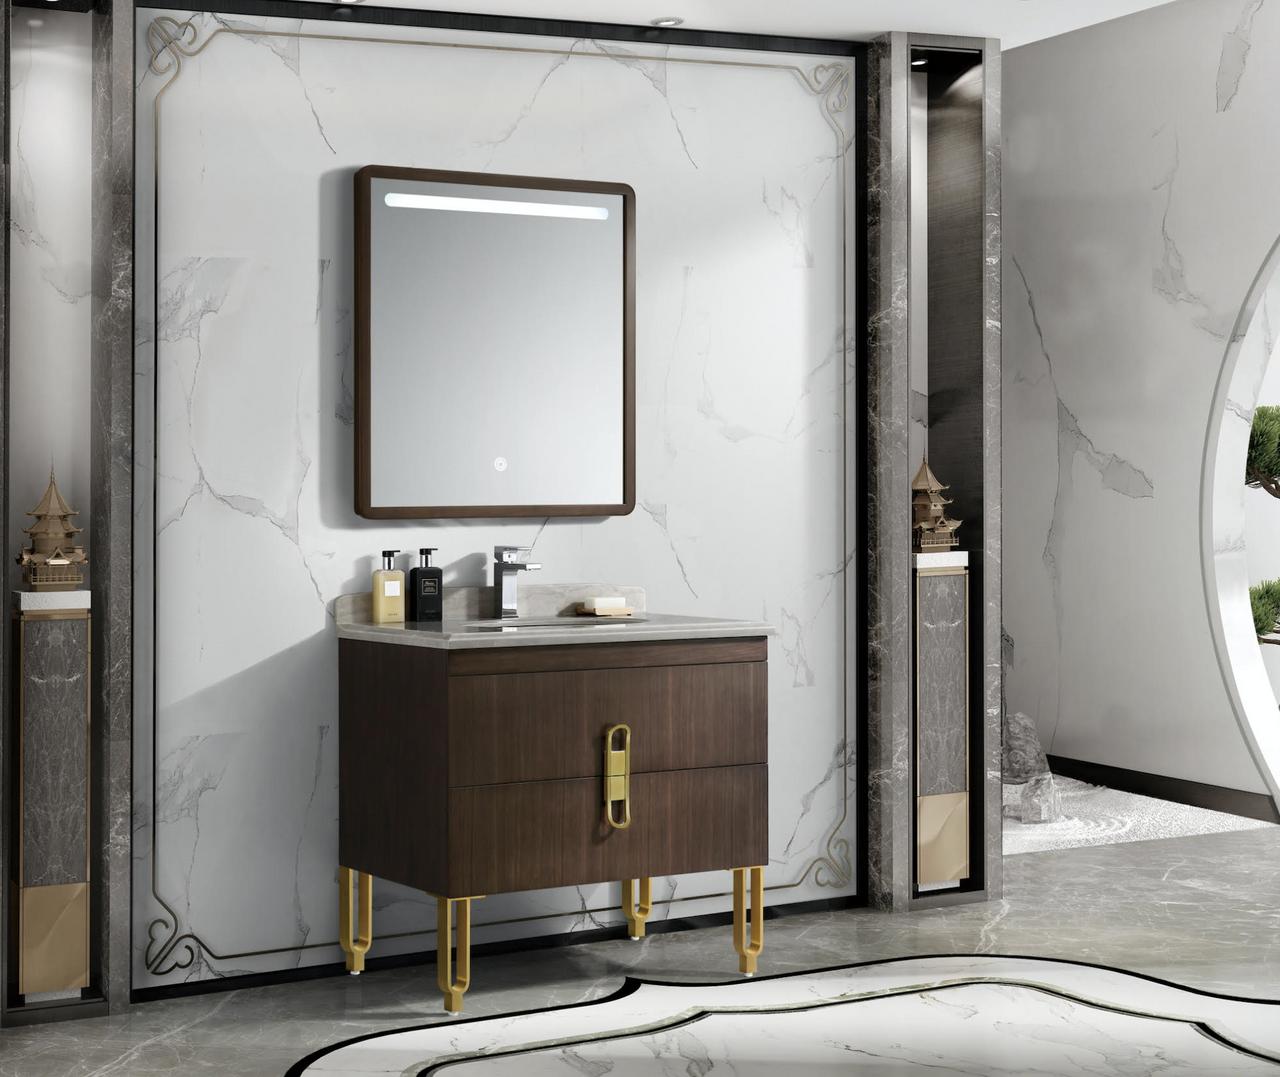 Reynolds 30 Inch Handmade Bathroom Vanity Italian Designer Collection Royal Bath Place